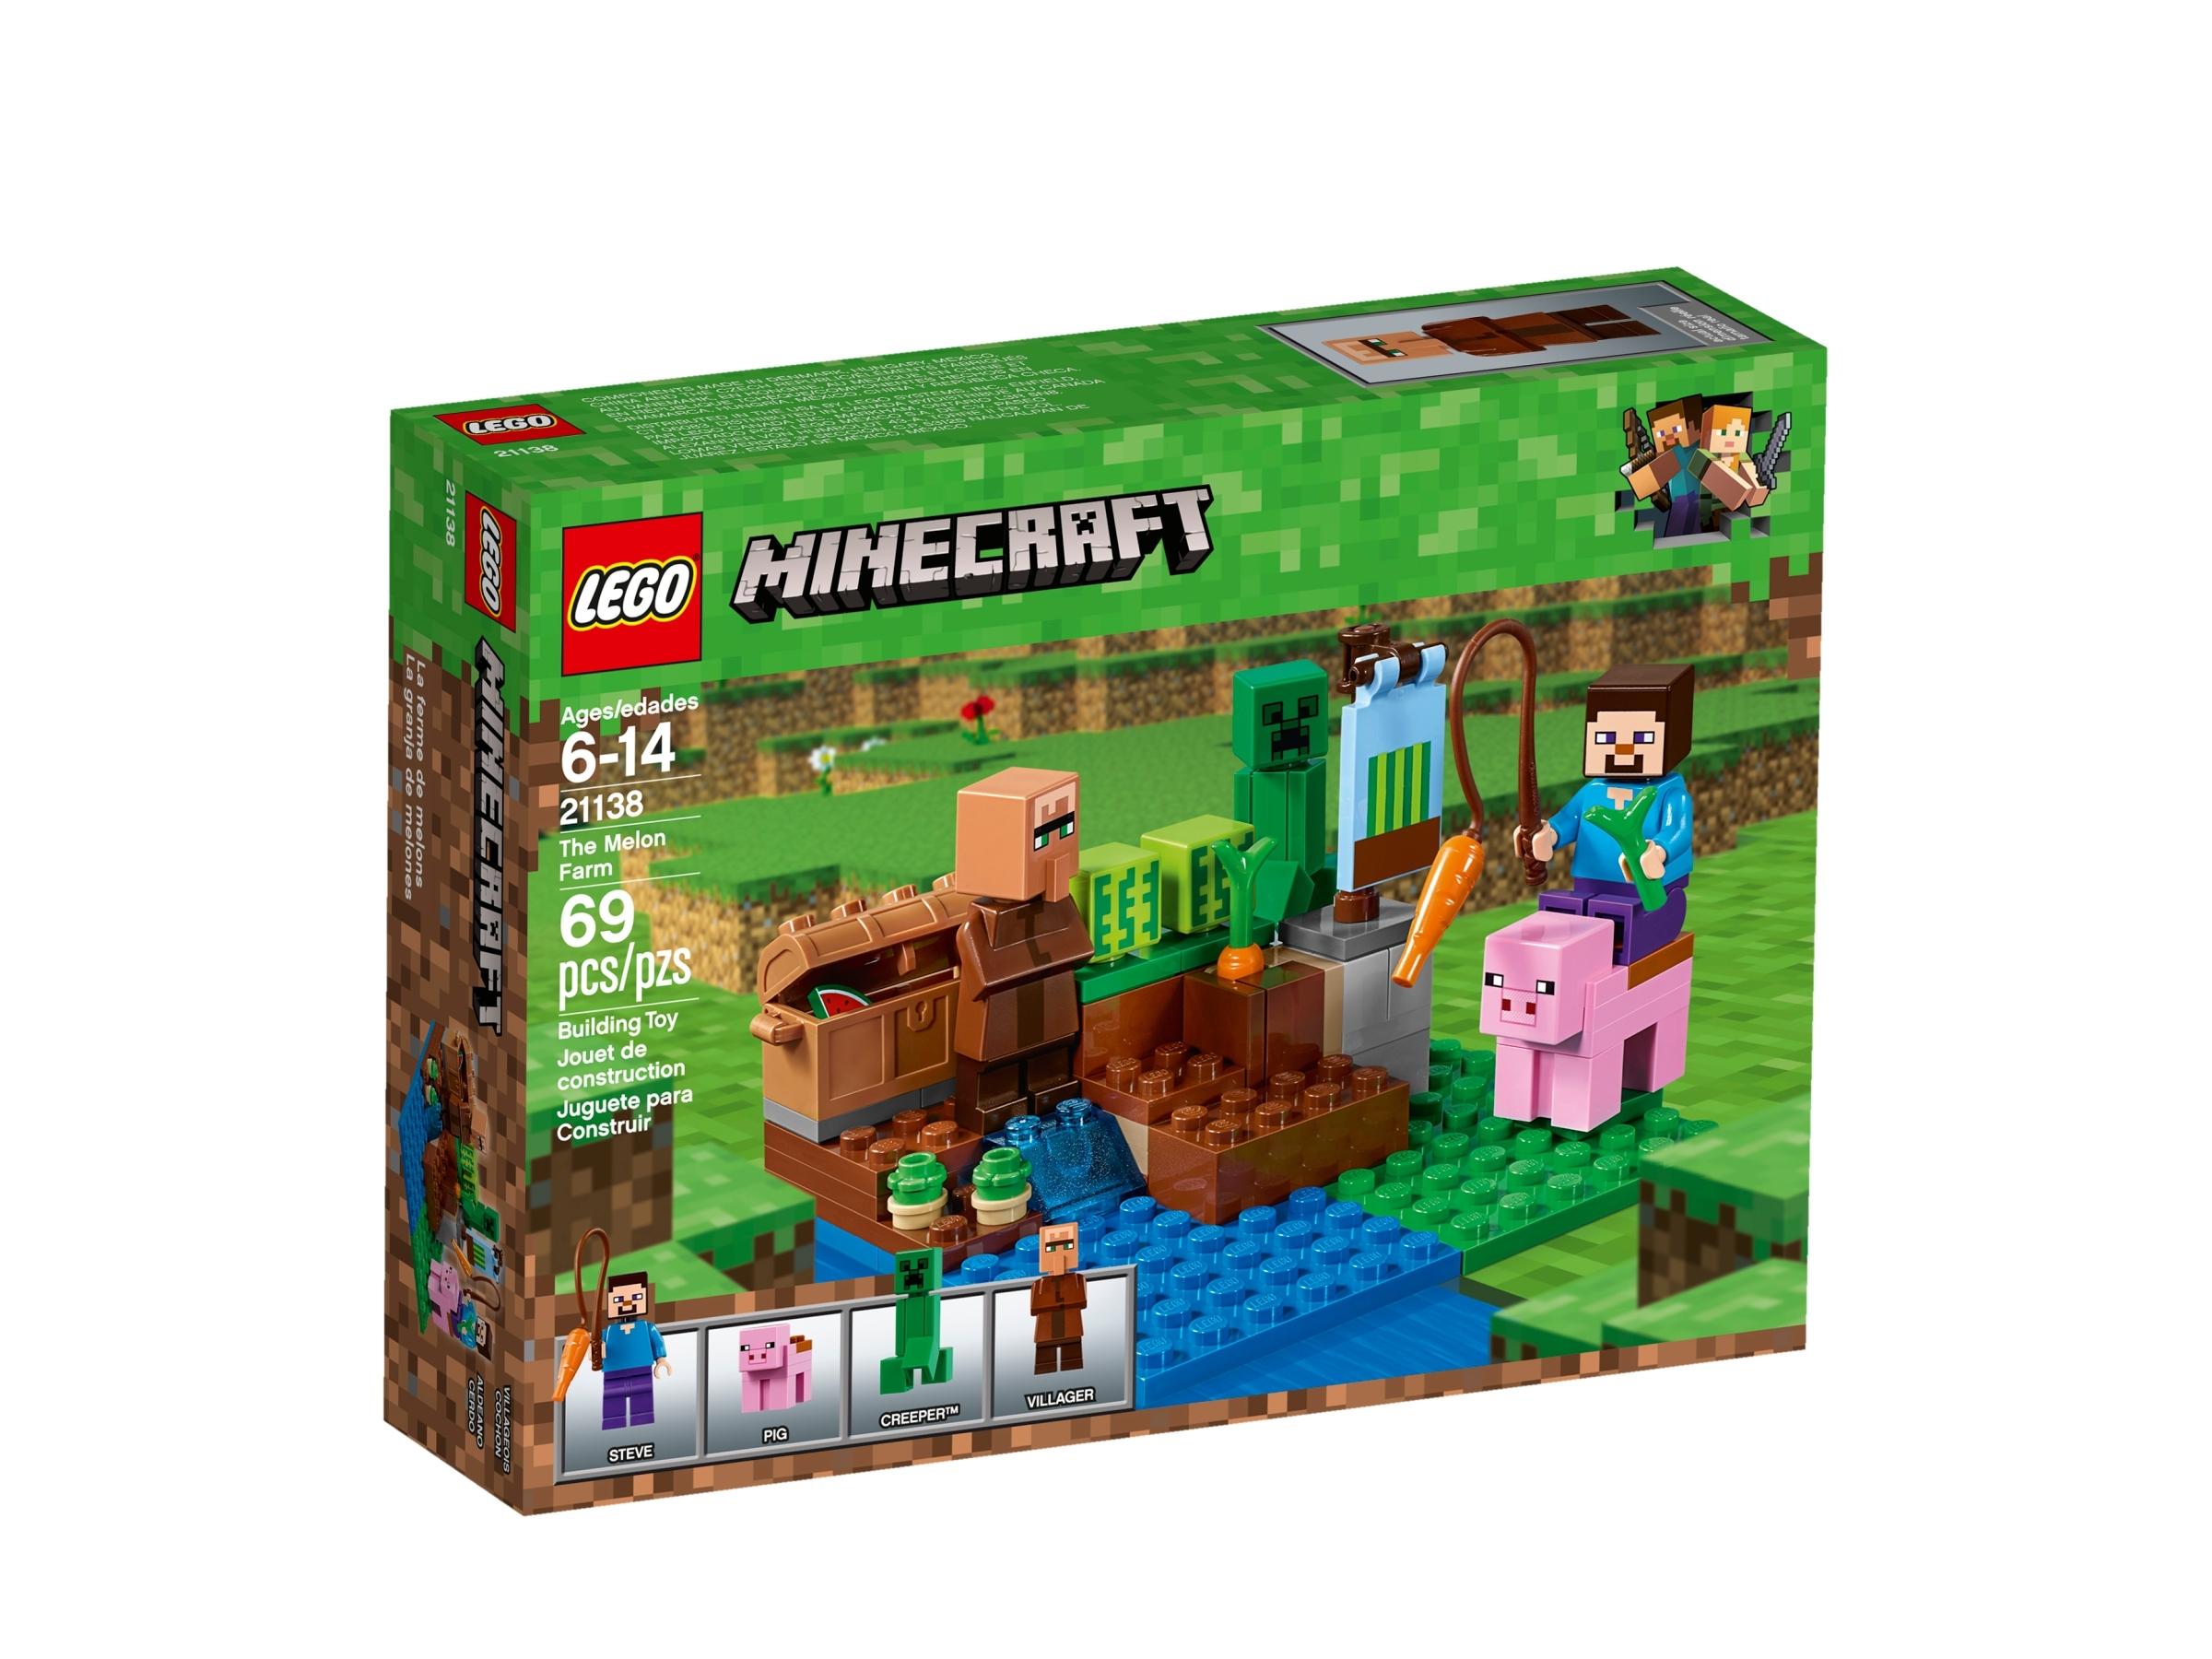 6212345 69 Piece LEGO Minecraft The Melon Farm 21138 Building Kit